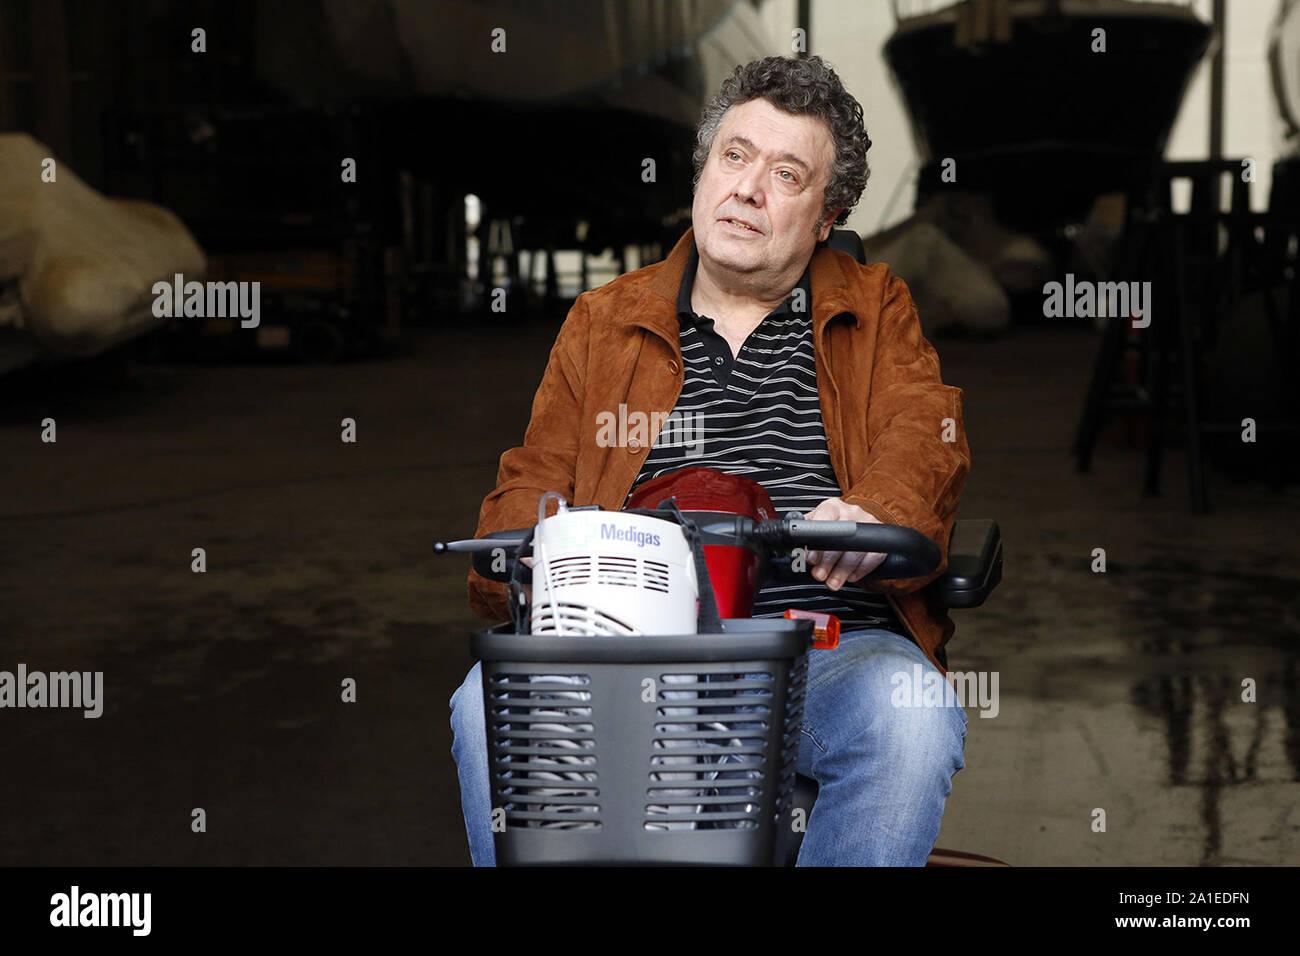 A Mano Disarmata 2019 De Claudio Bonivento Rodolfo Lagana